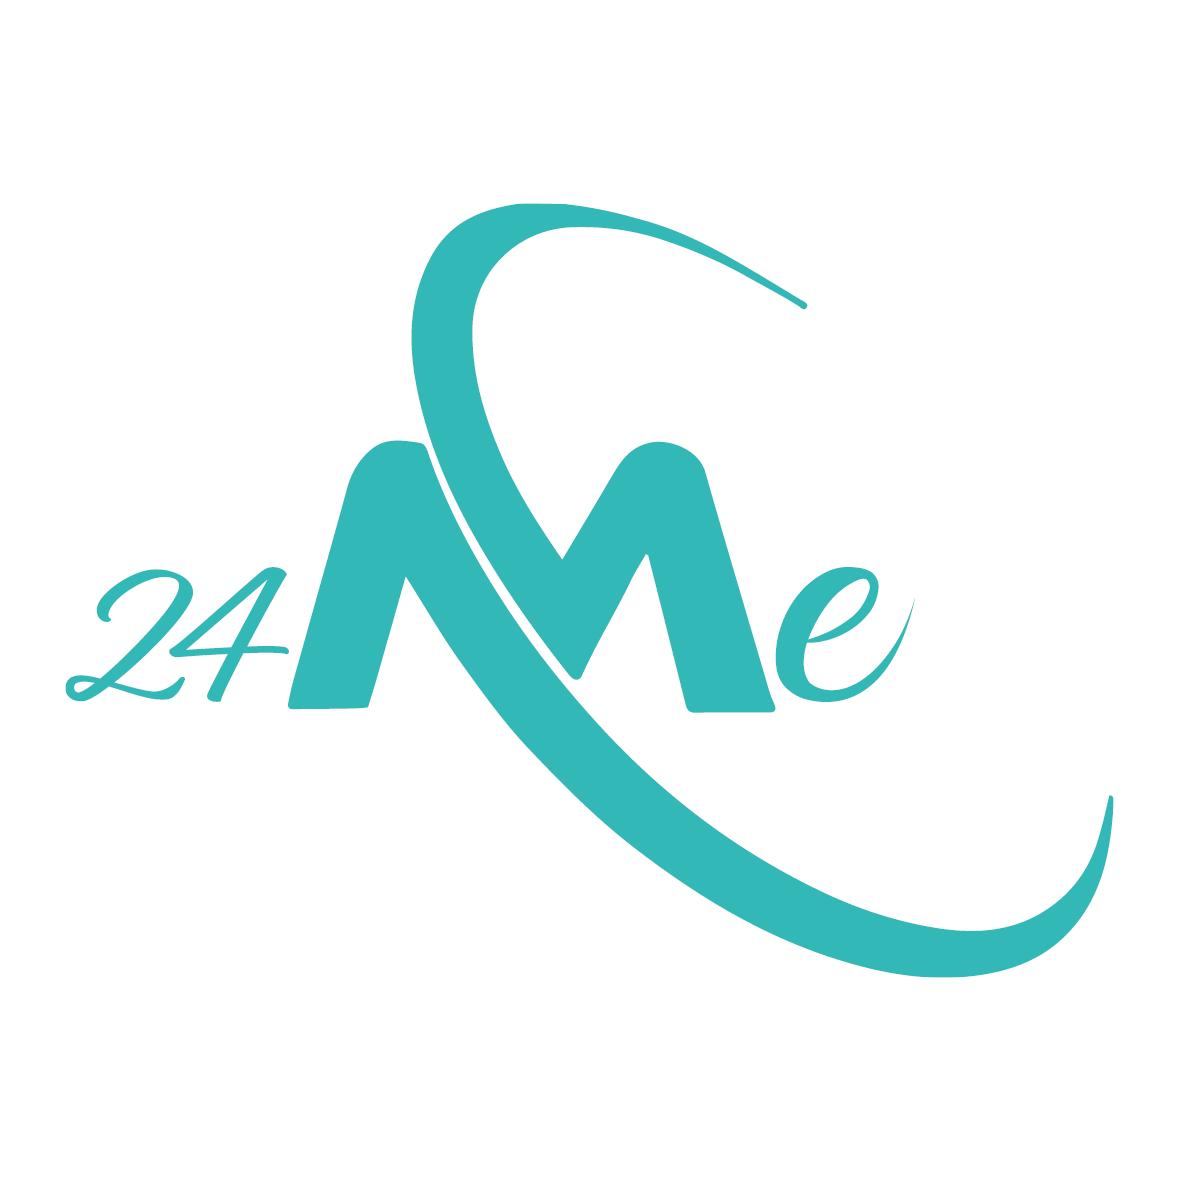 24me.png